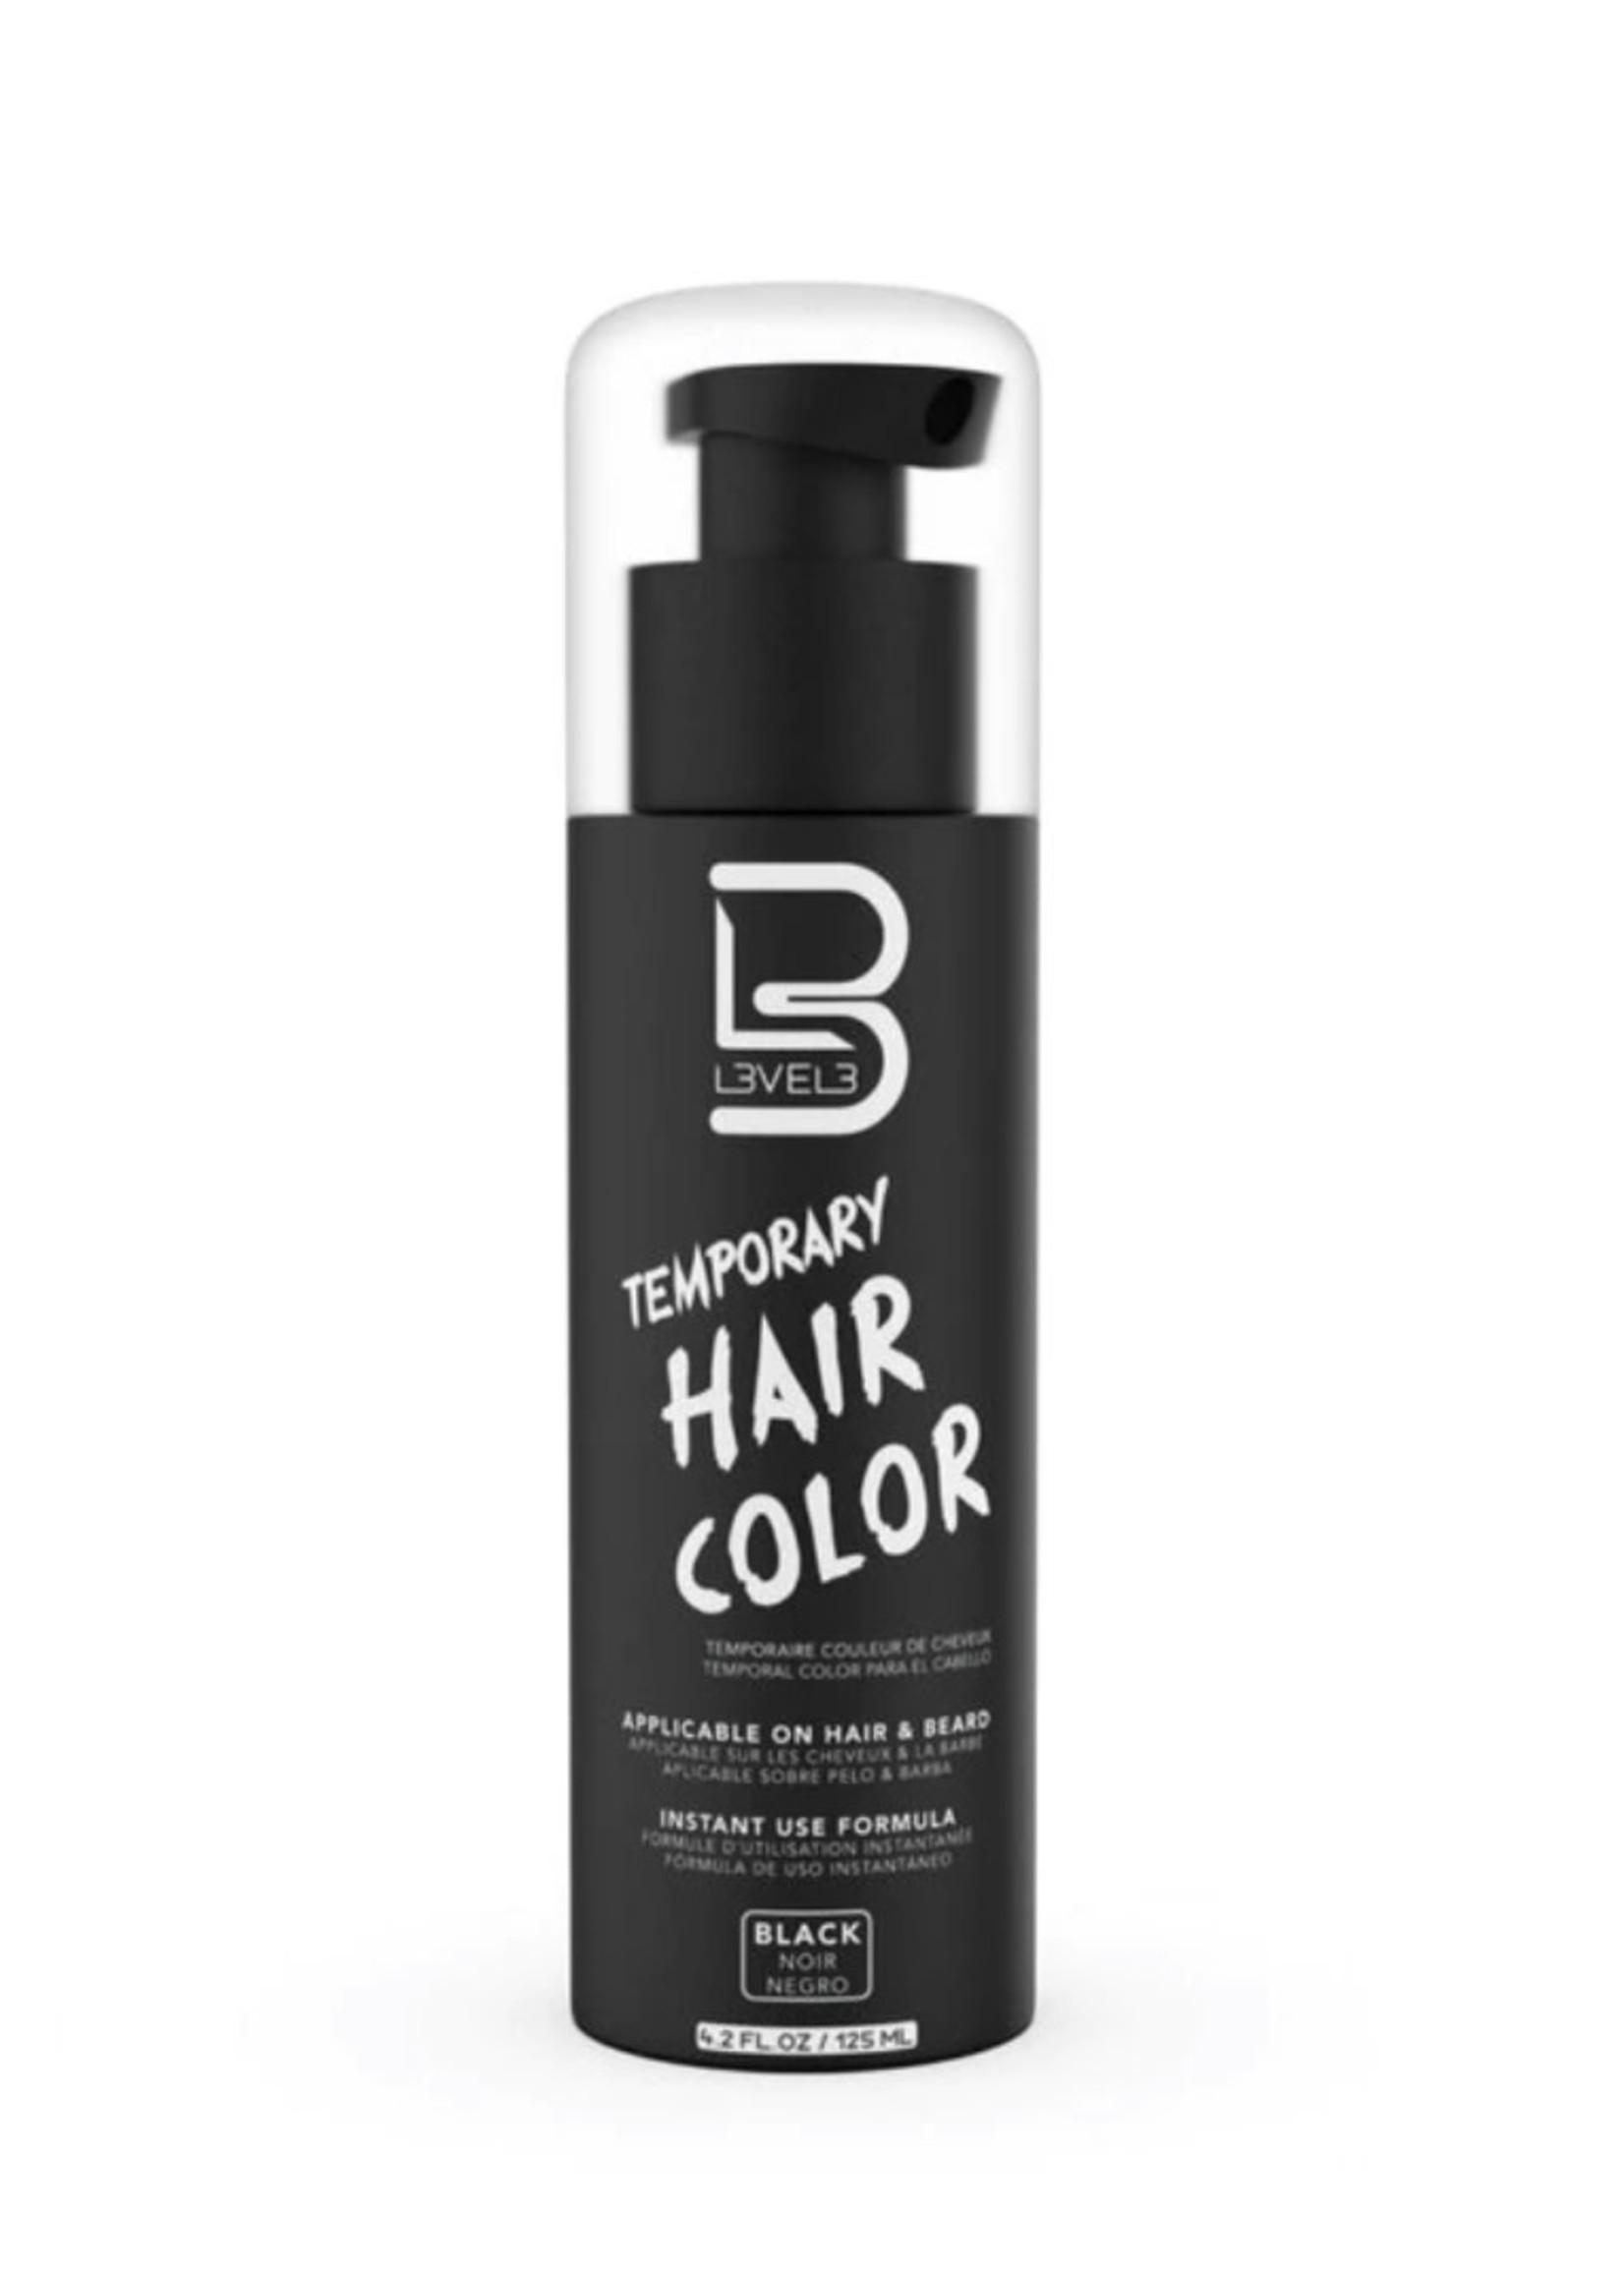 Level 3 L3 Temporary Beard Color Black Dye-100ML